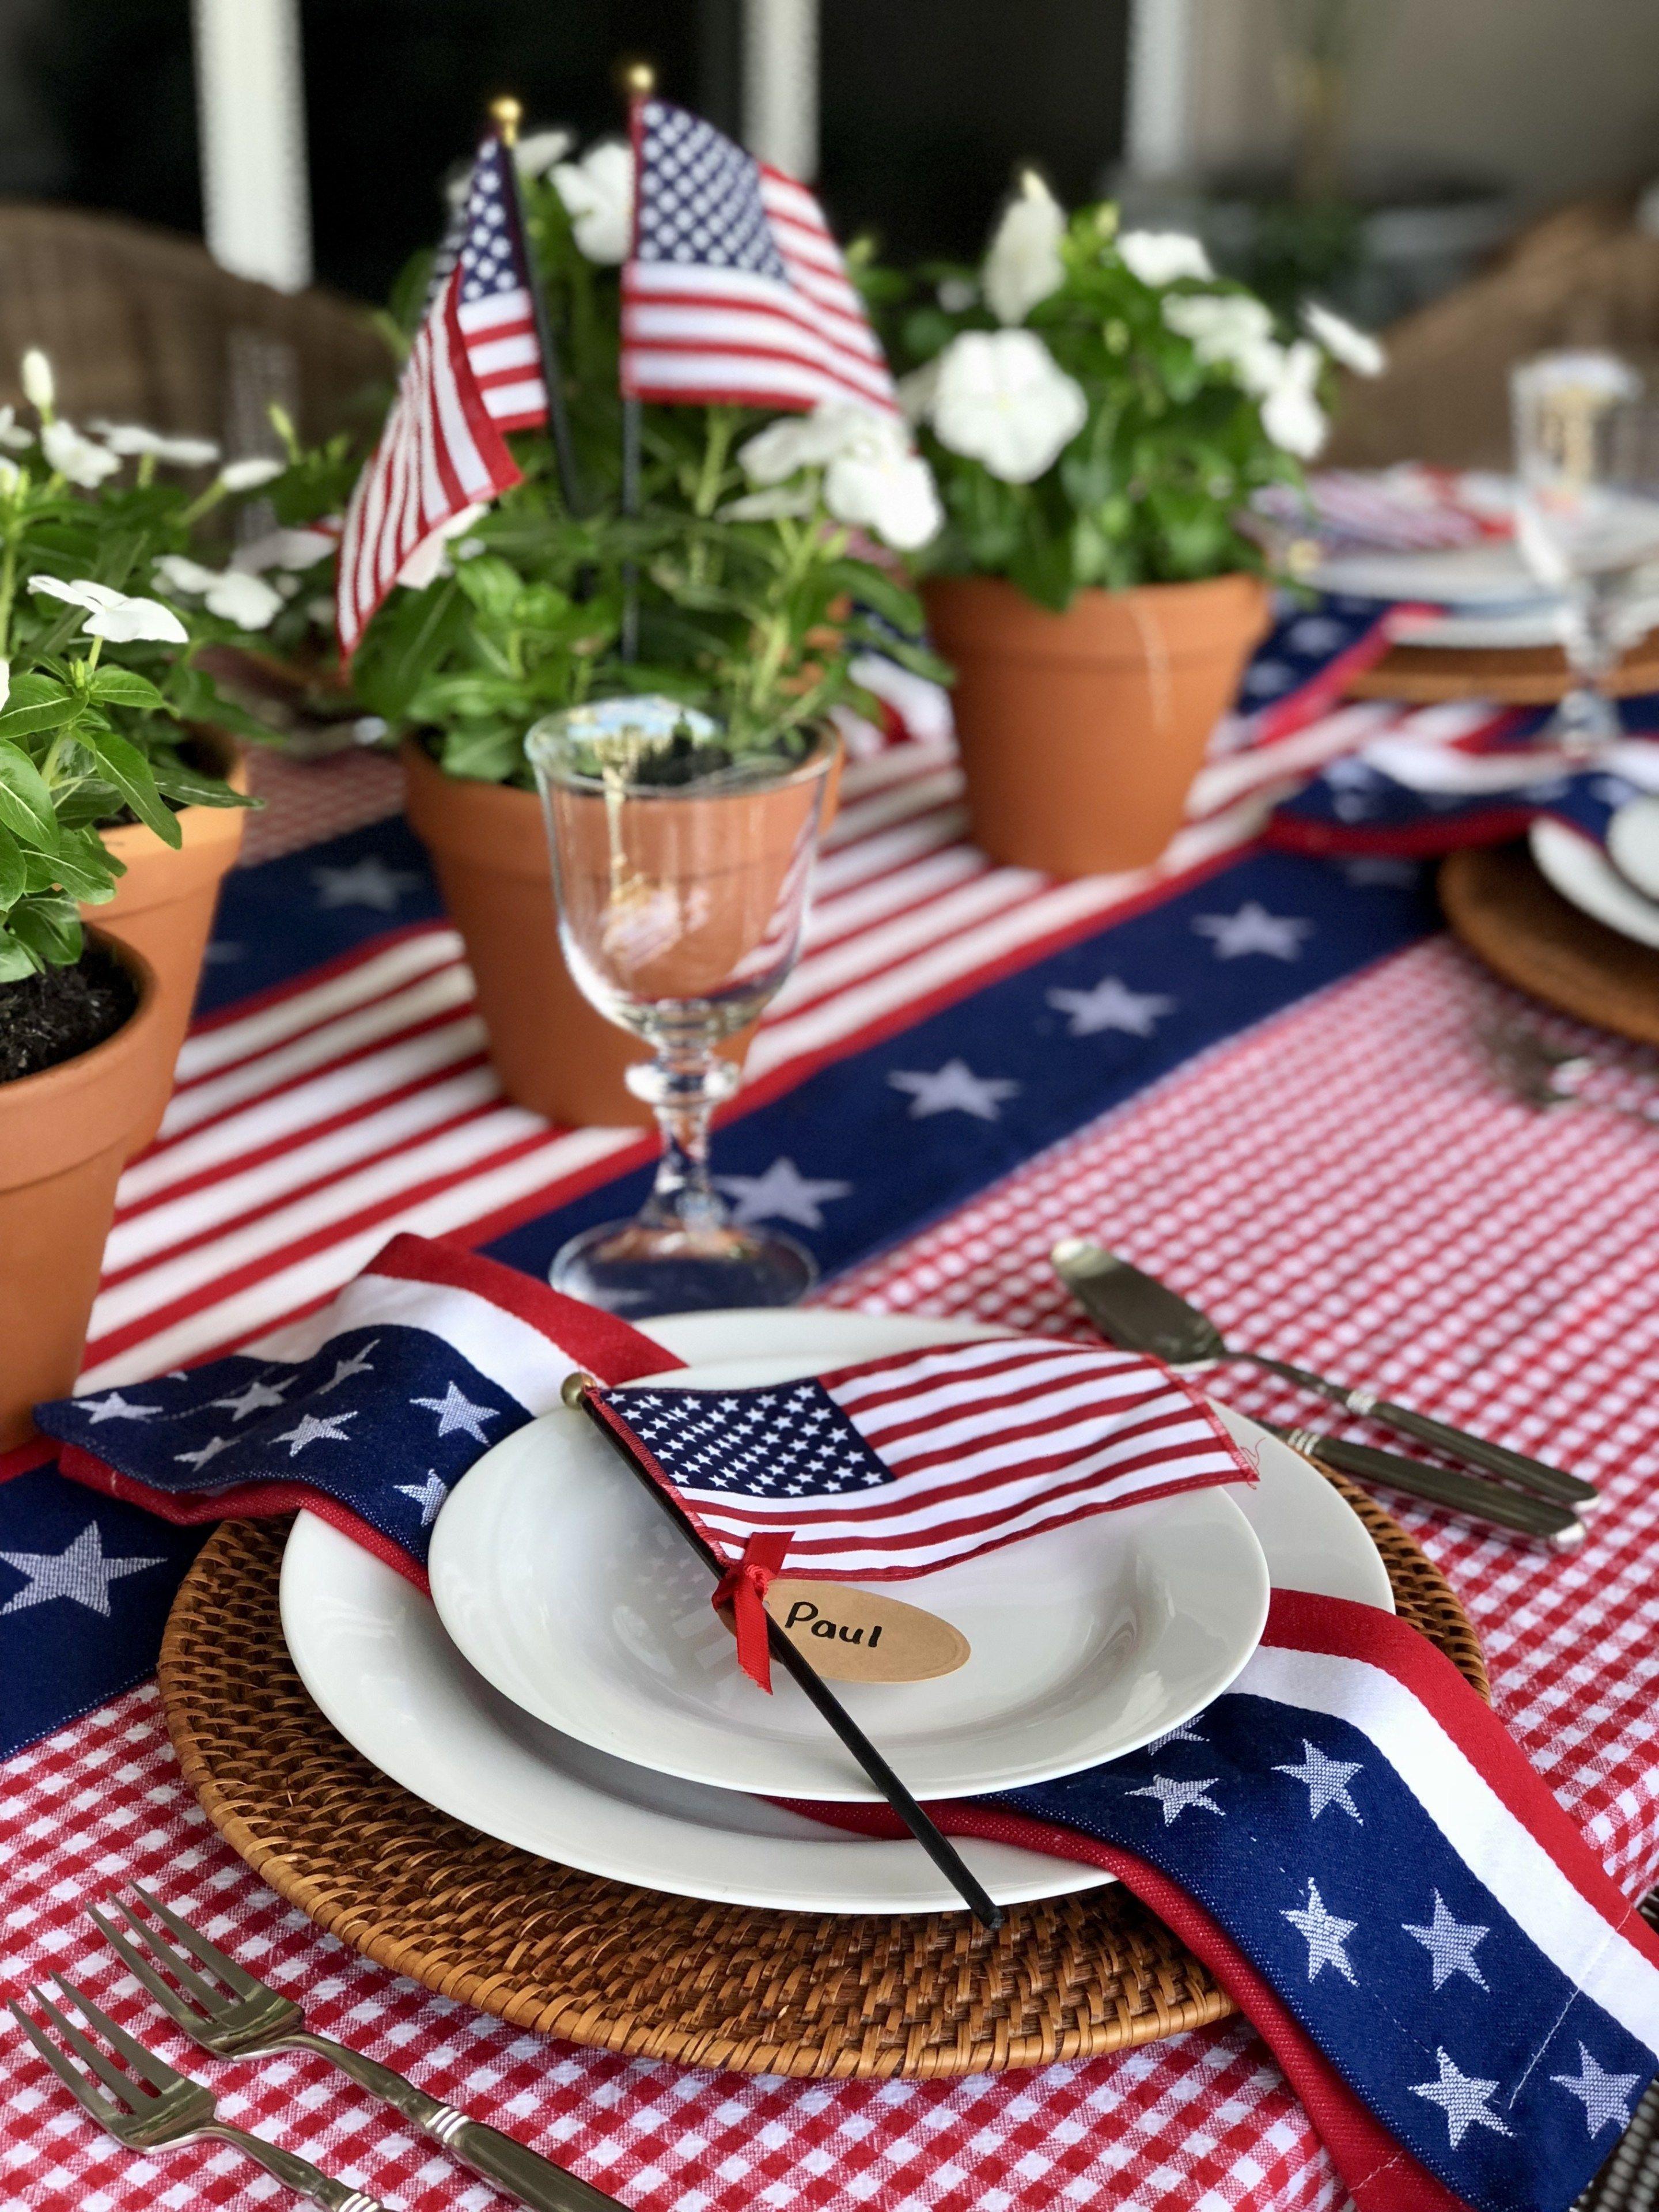 Patriotic Tablescape Holiday Table Decorations Patriotic Table